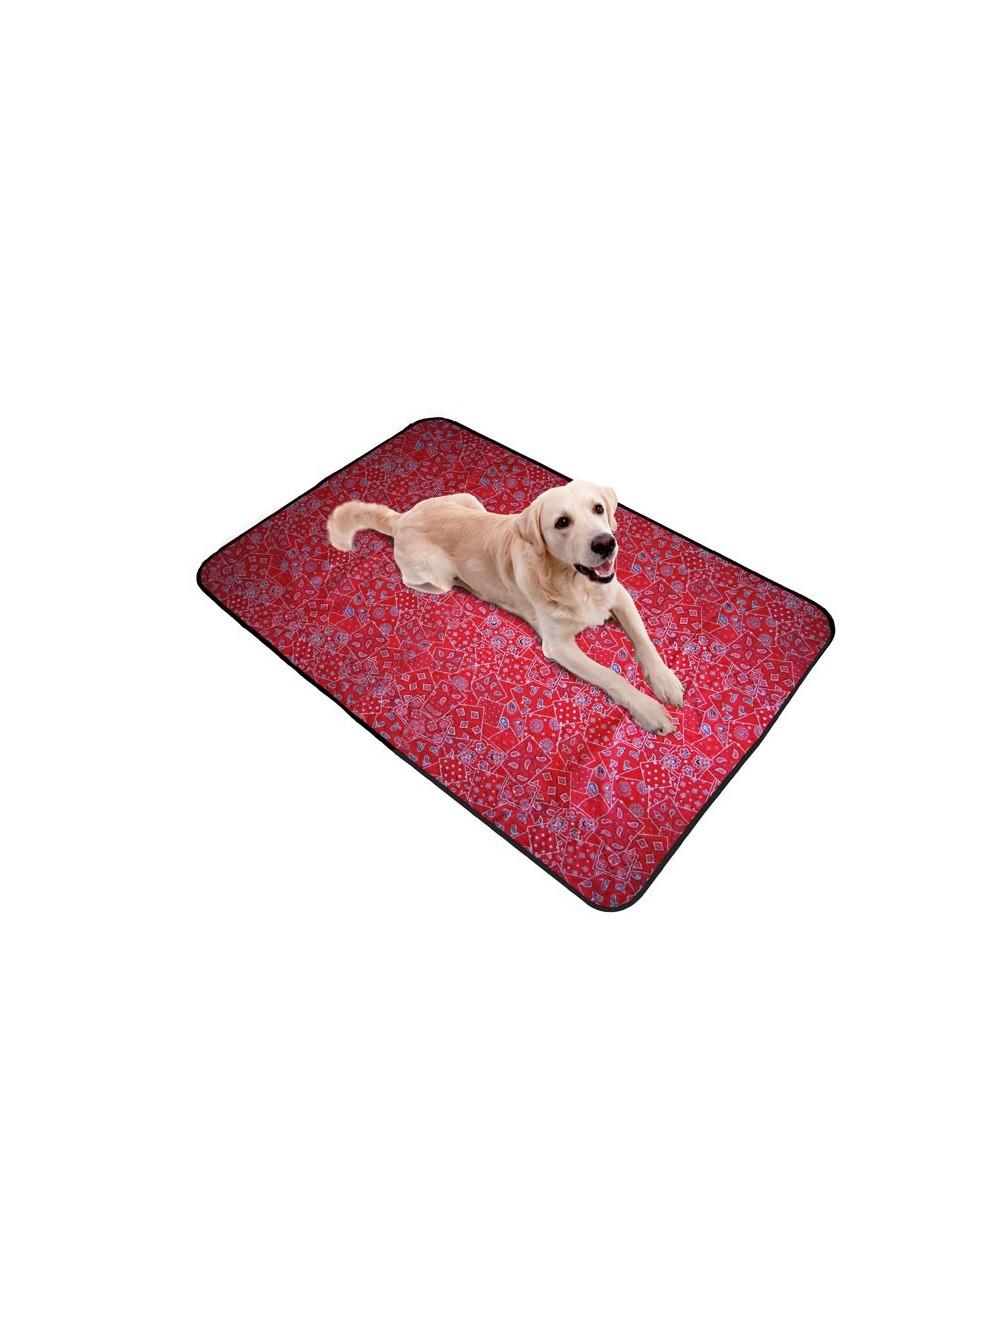 Aqua coolkeeper tappeto refrigerante xxl per cane red - Tappetino riscaldante per cani ...